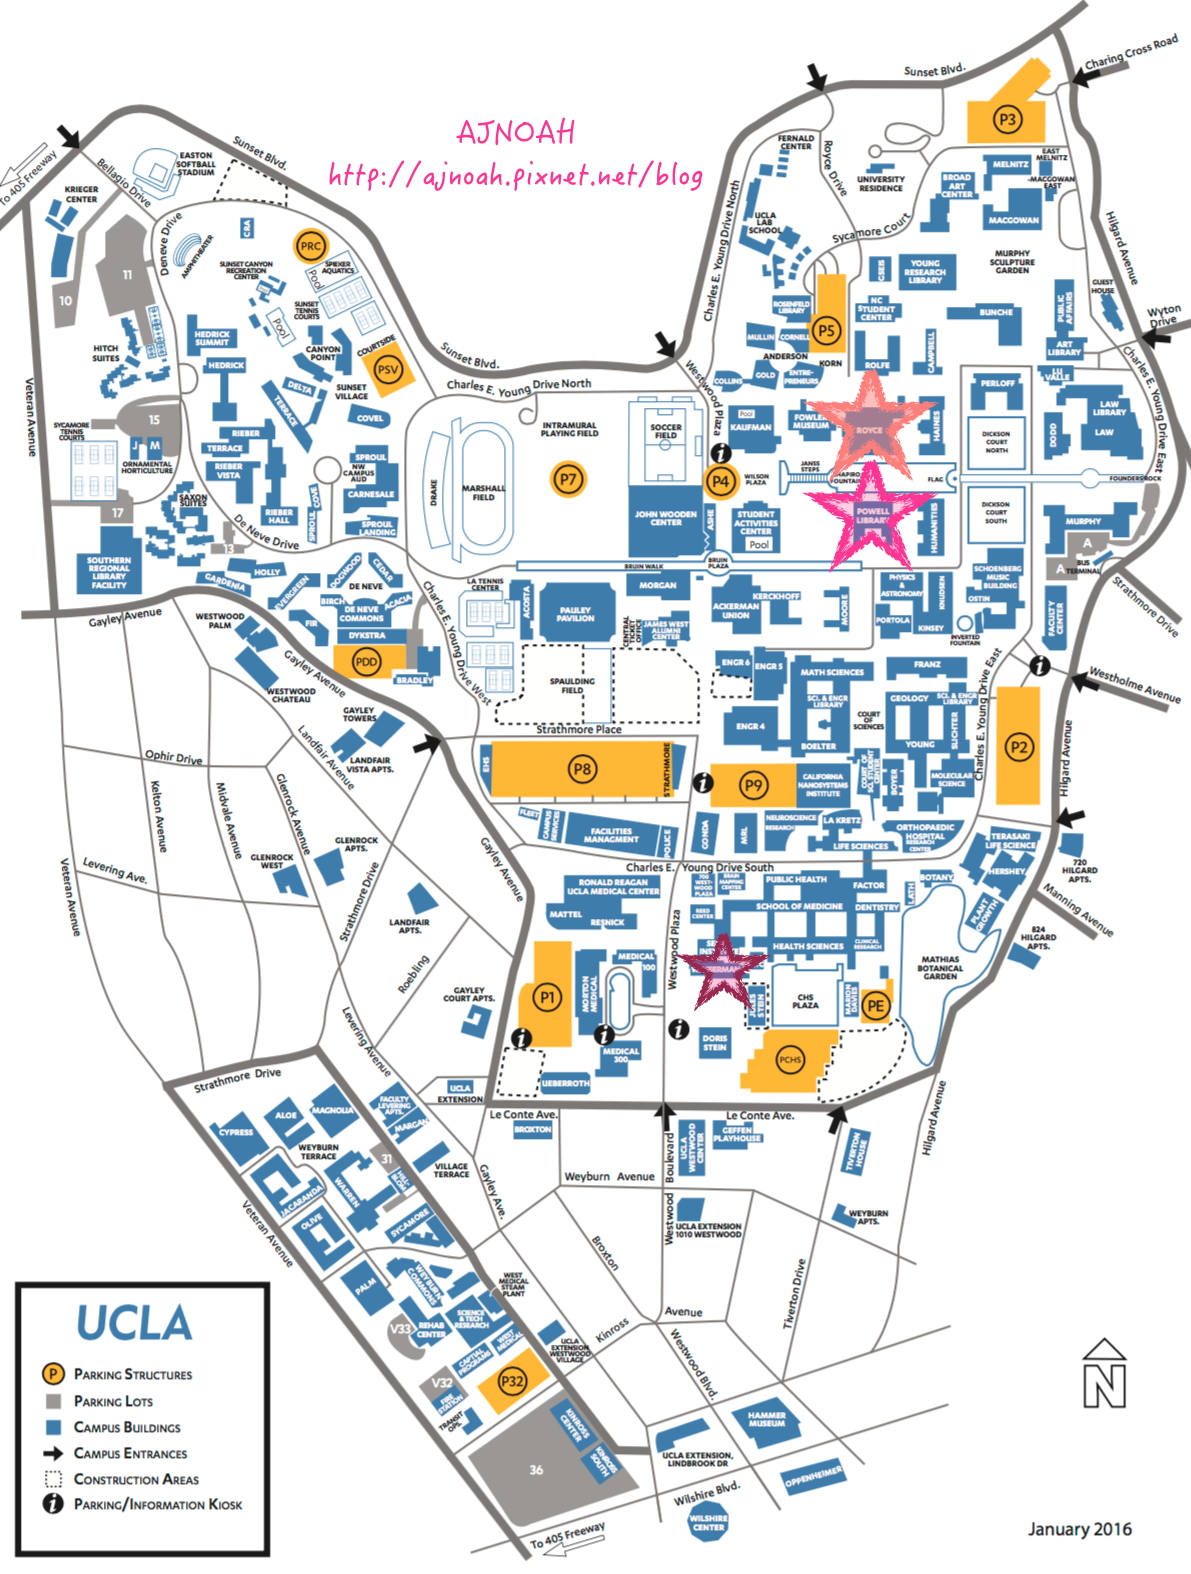 UCLA 洛杉磯加大 - 莘莘學子夢寐以求的大學